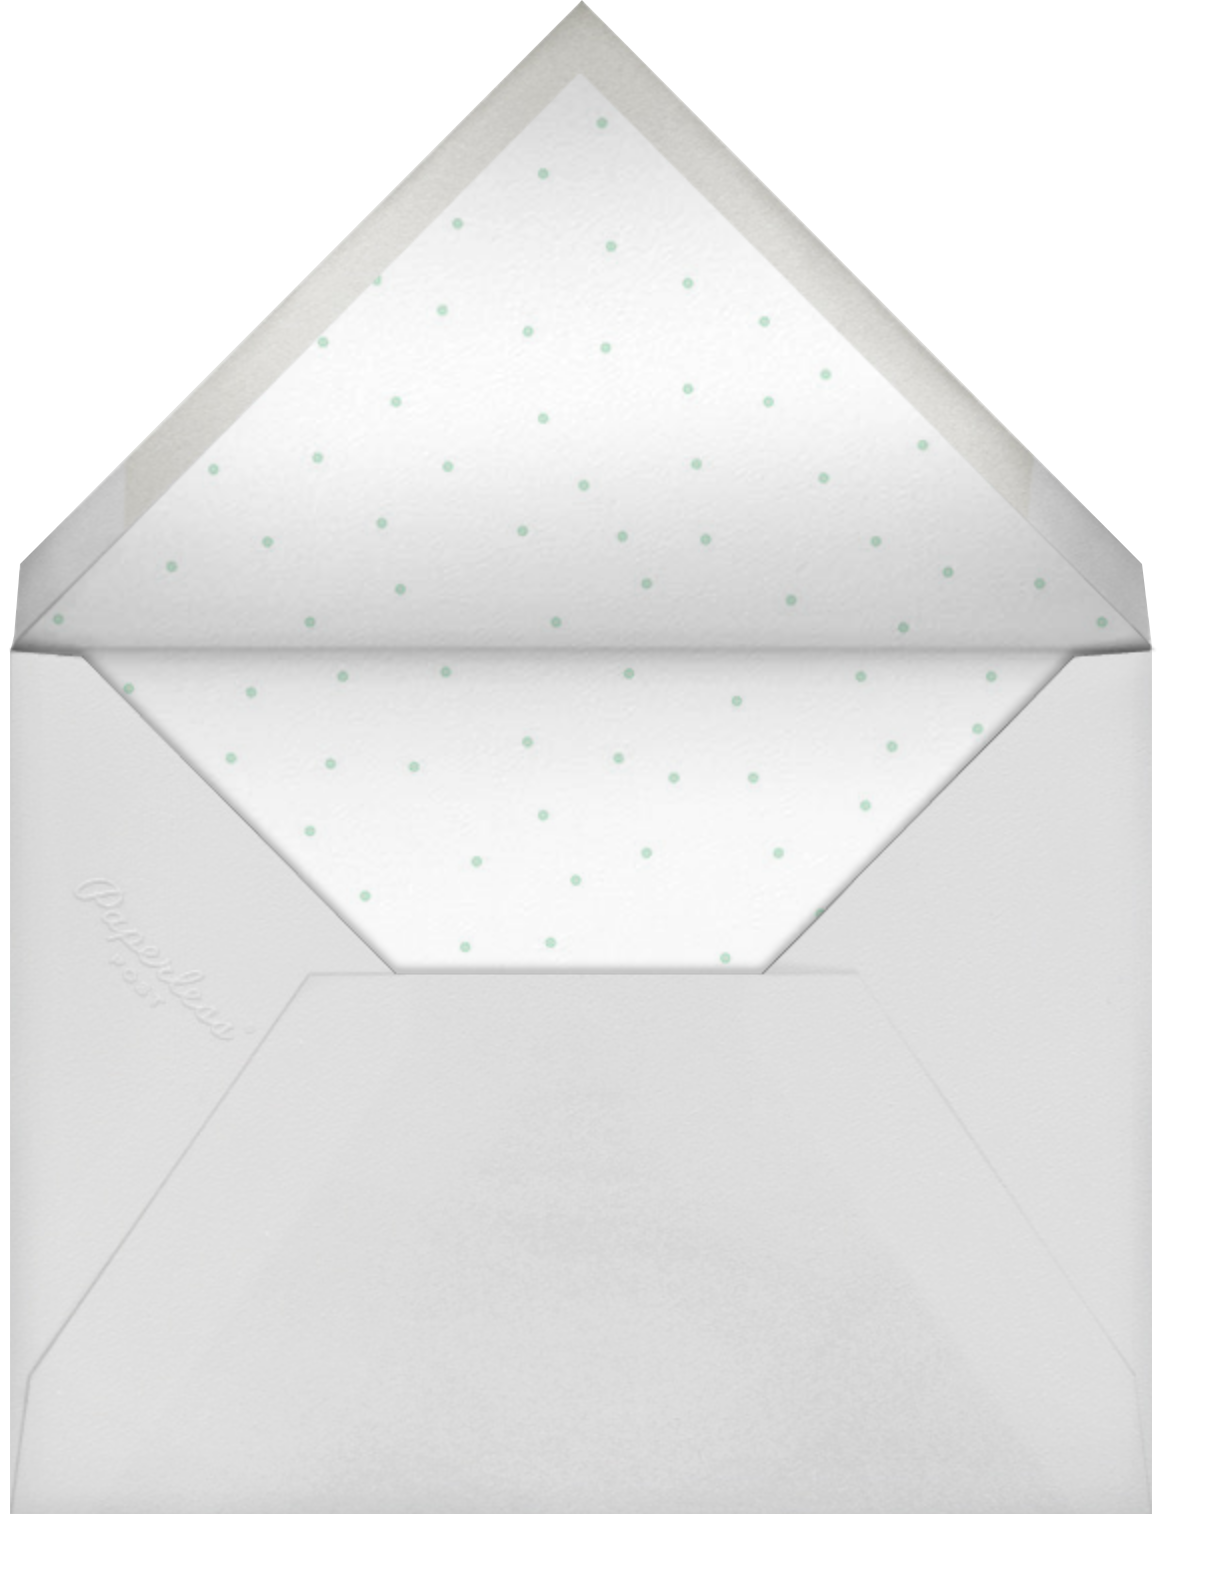 Watercolor Retirement - Teal - Paper Source - Envelope